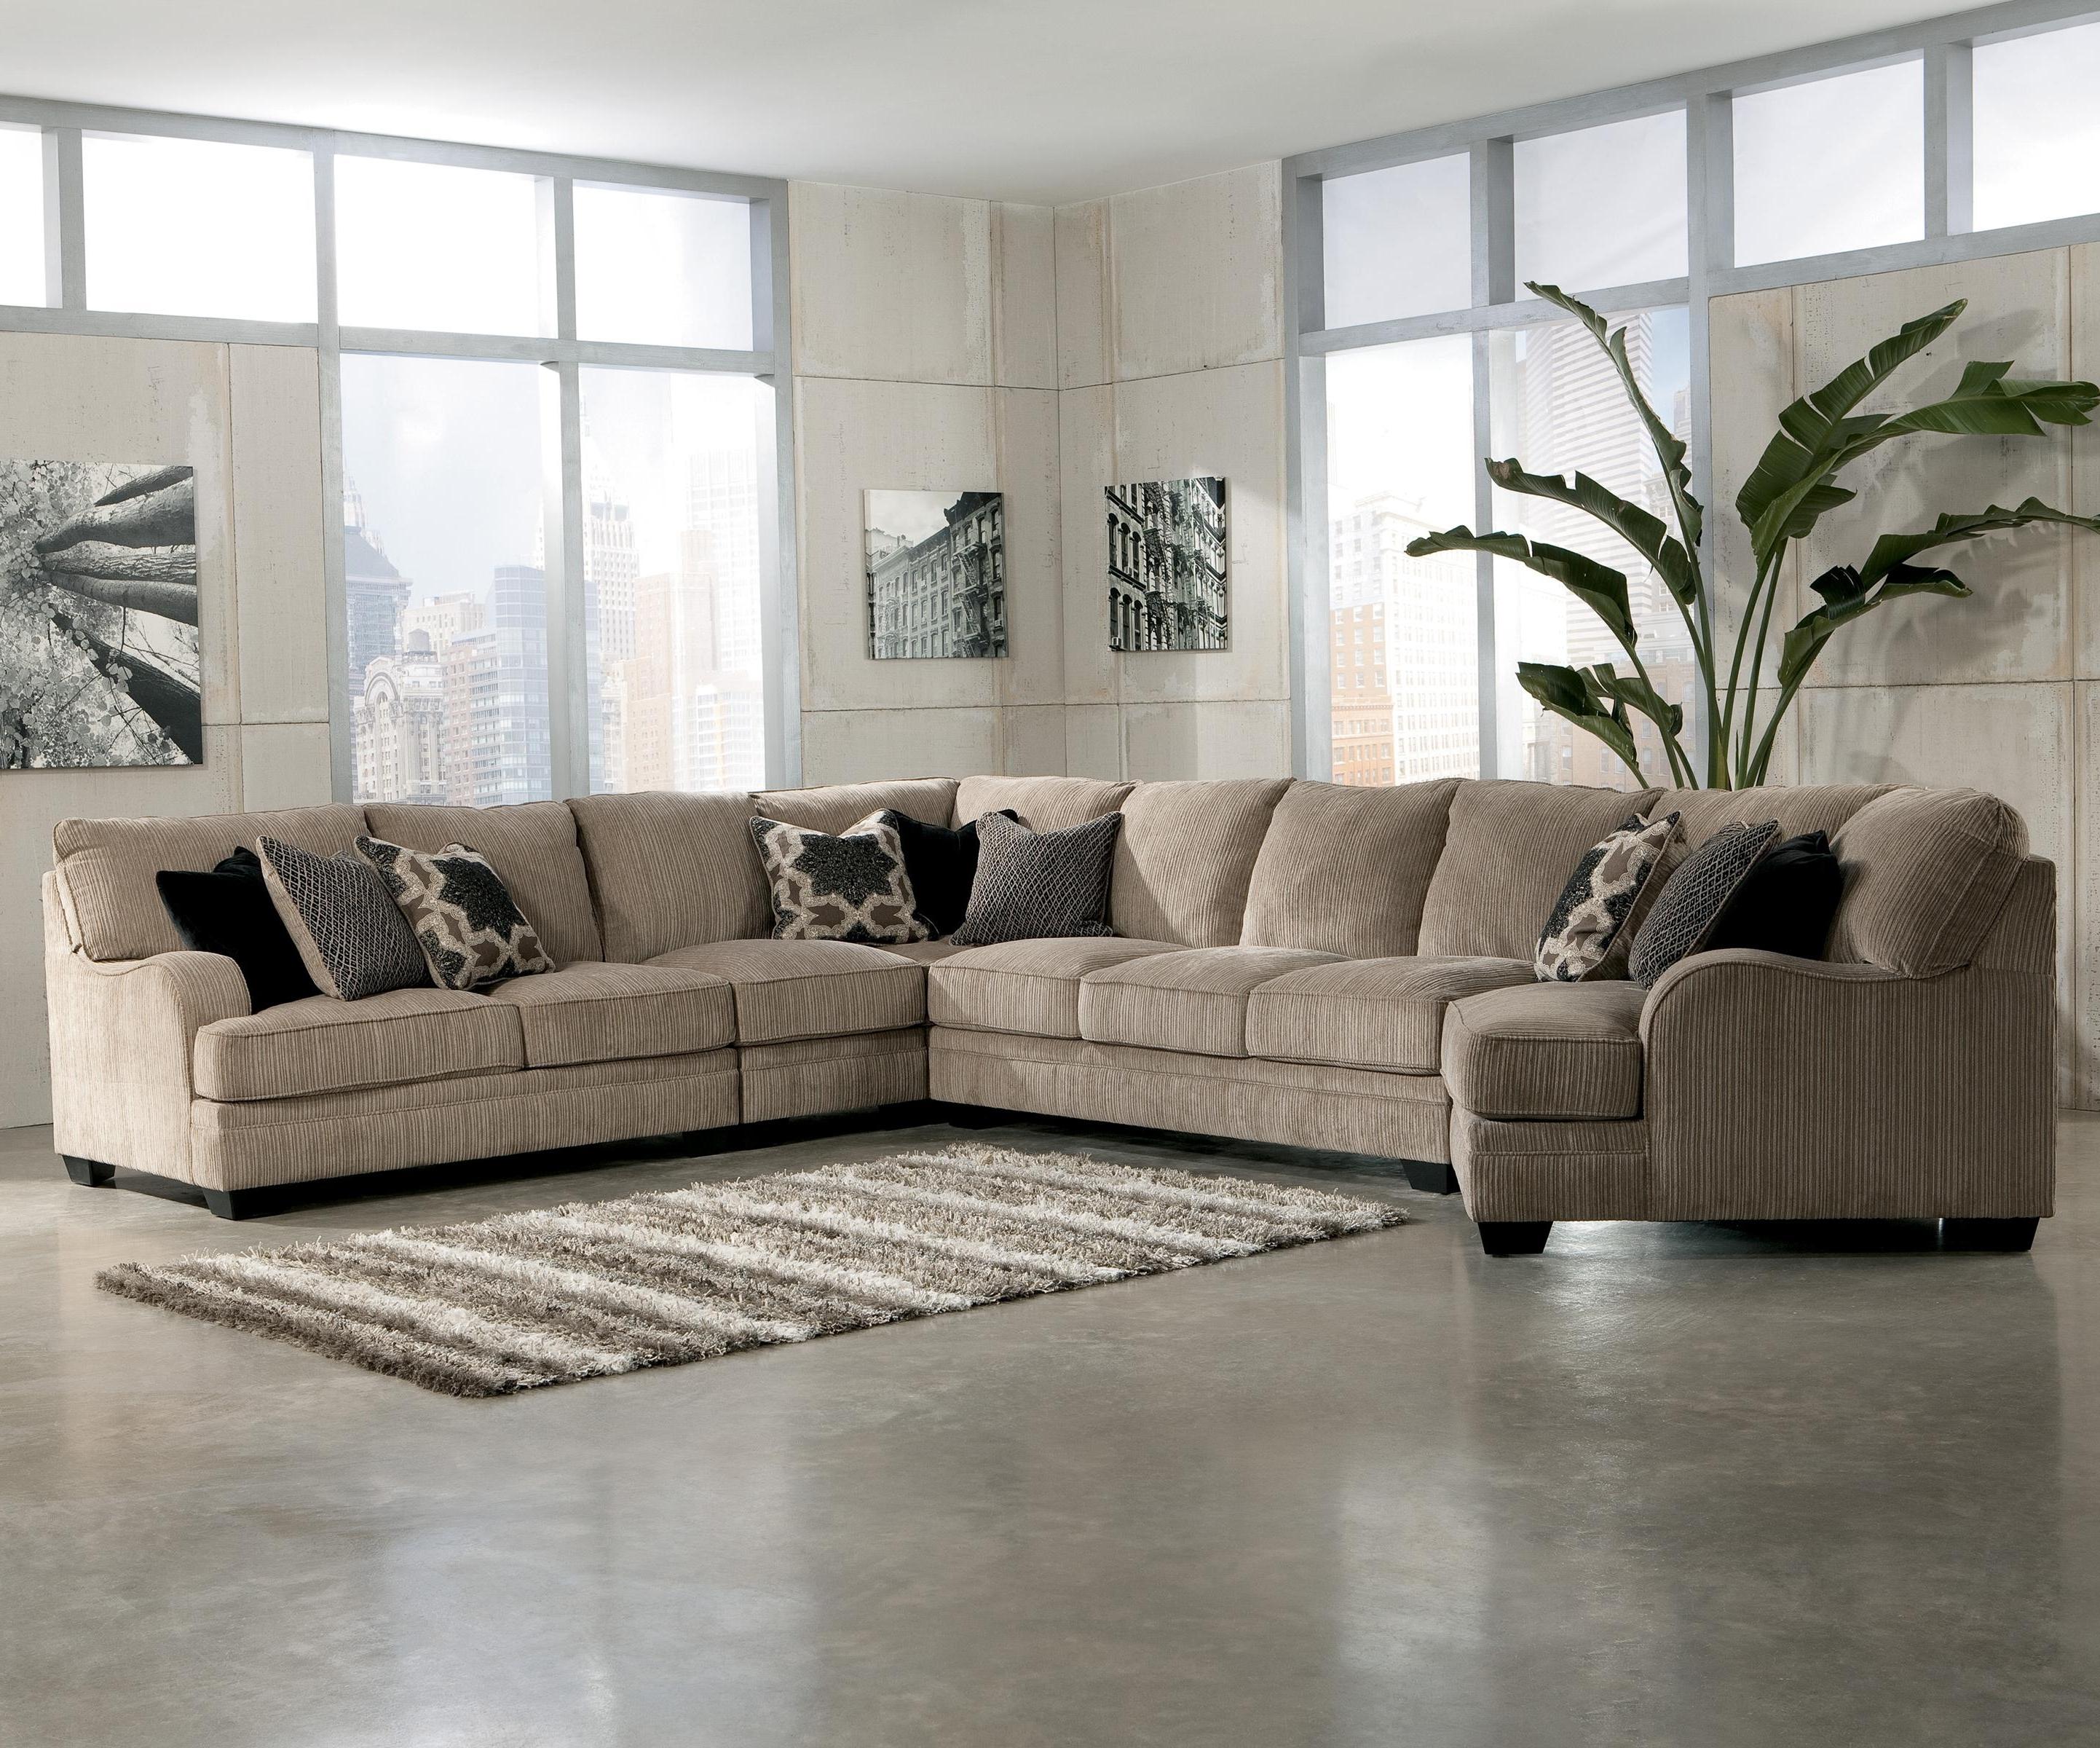 Popular Jonesboro Ar Sectional Sofas For Signature Designashley Katisha – Platinum 5 Piece Sectional (View 9 of 15)